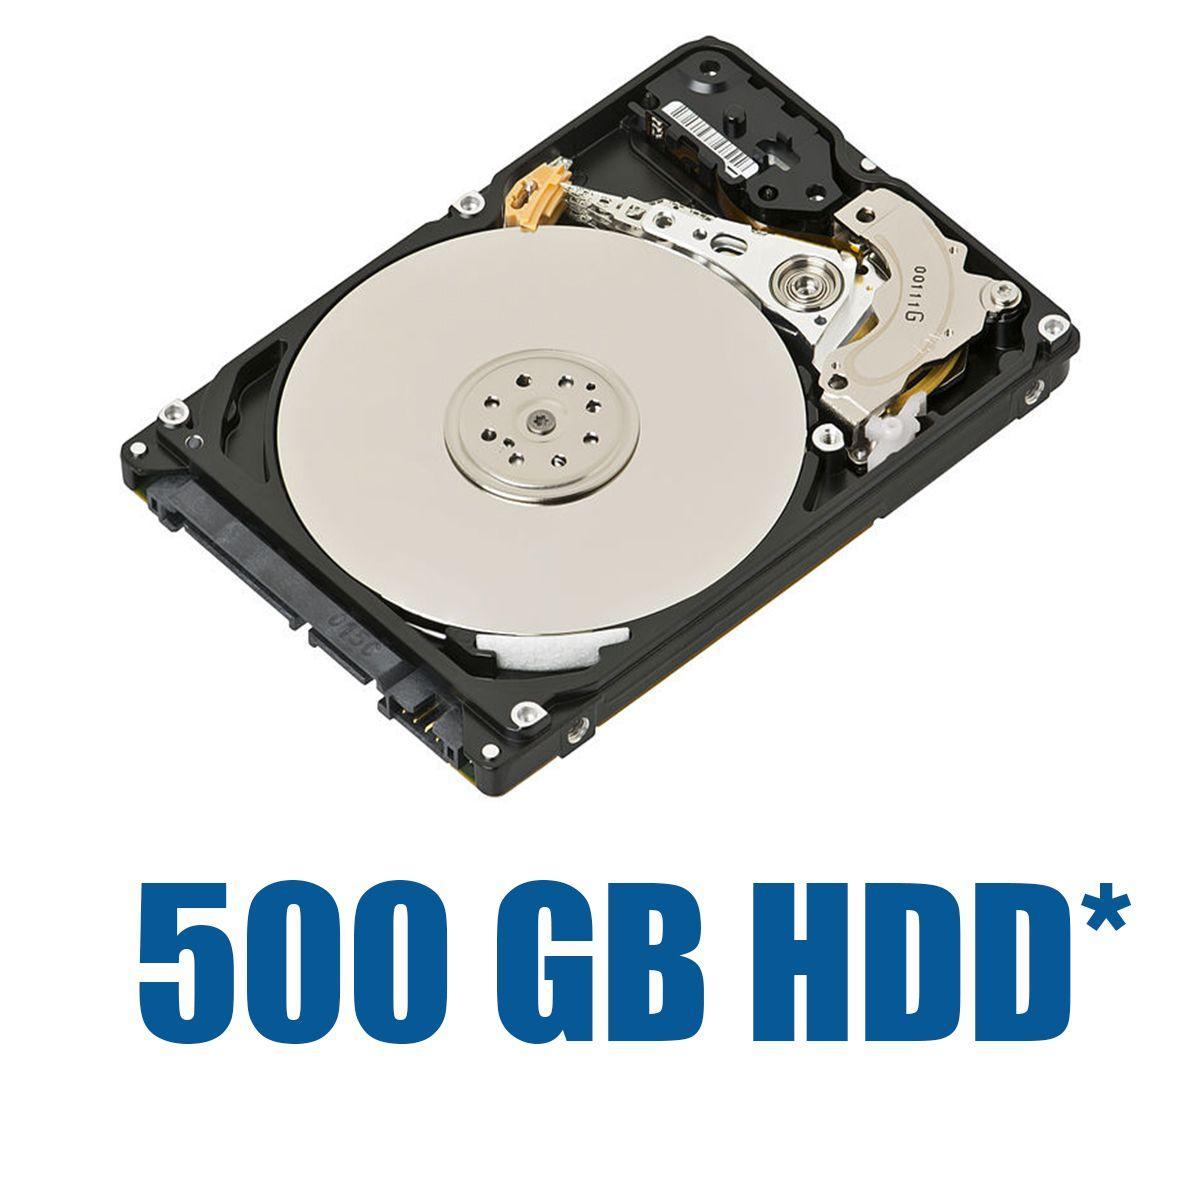 Модификация: Комплектация жестким диском 500 GB